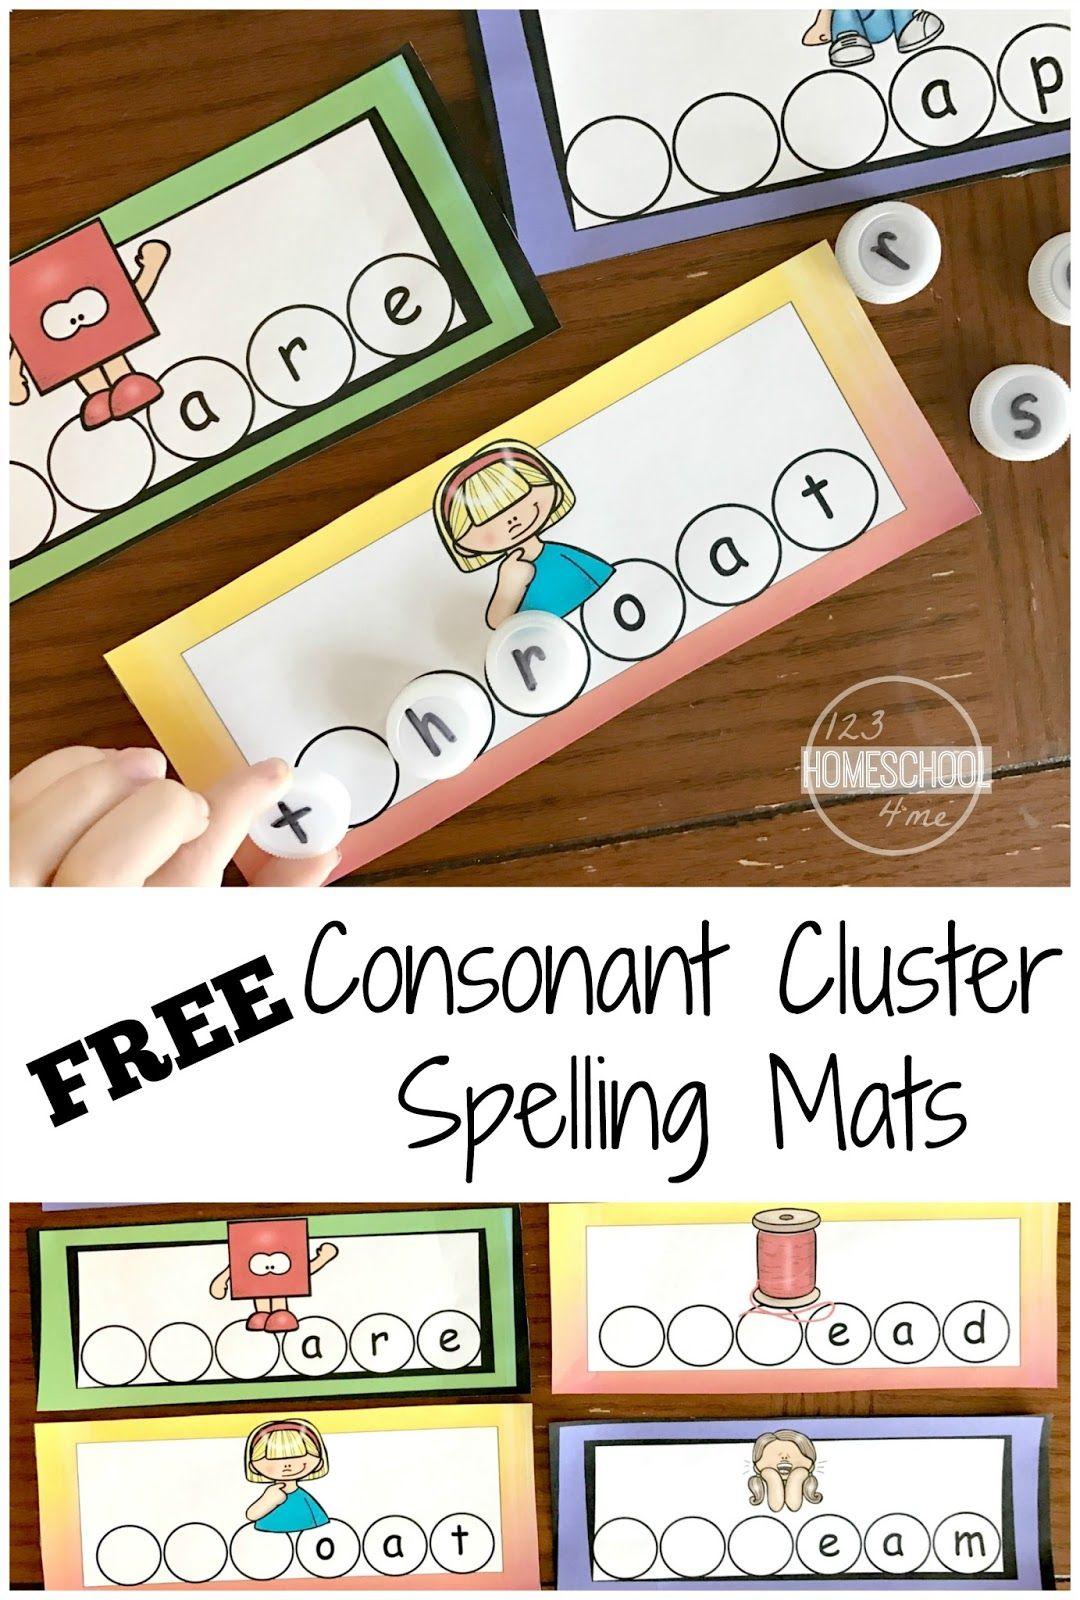 Consonant Clusters Spelling Mats